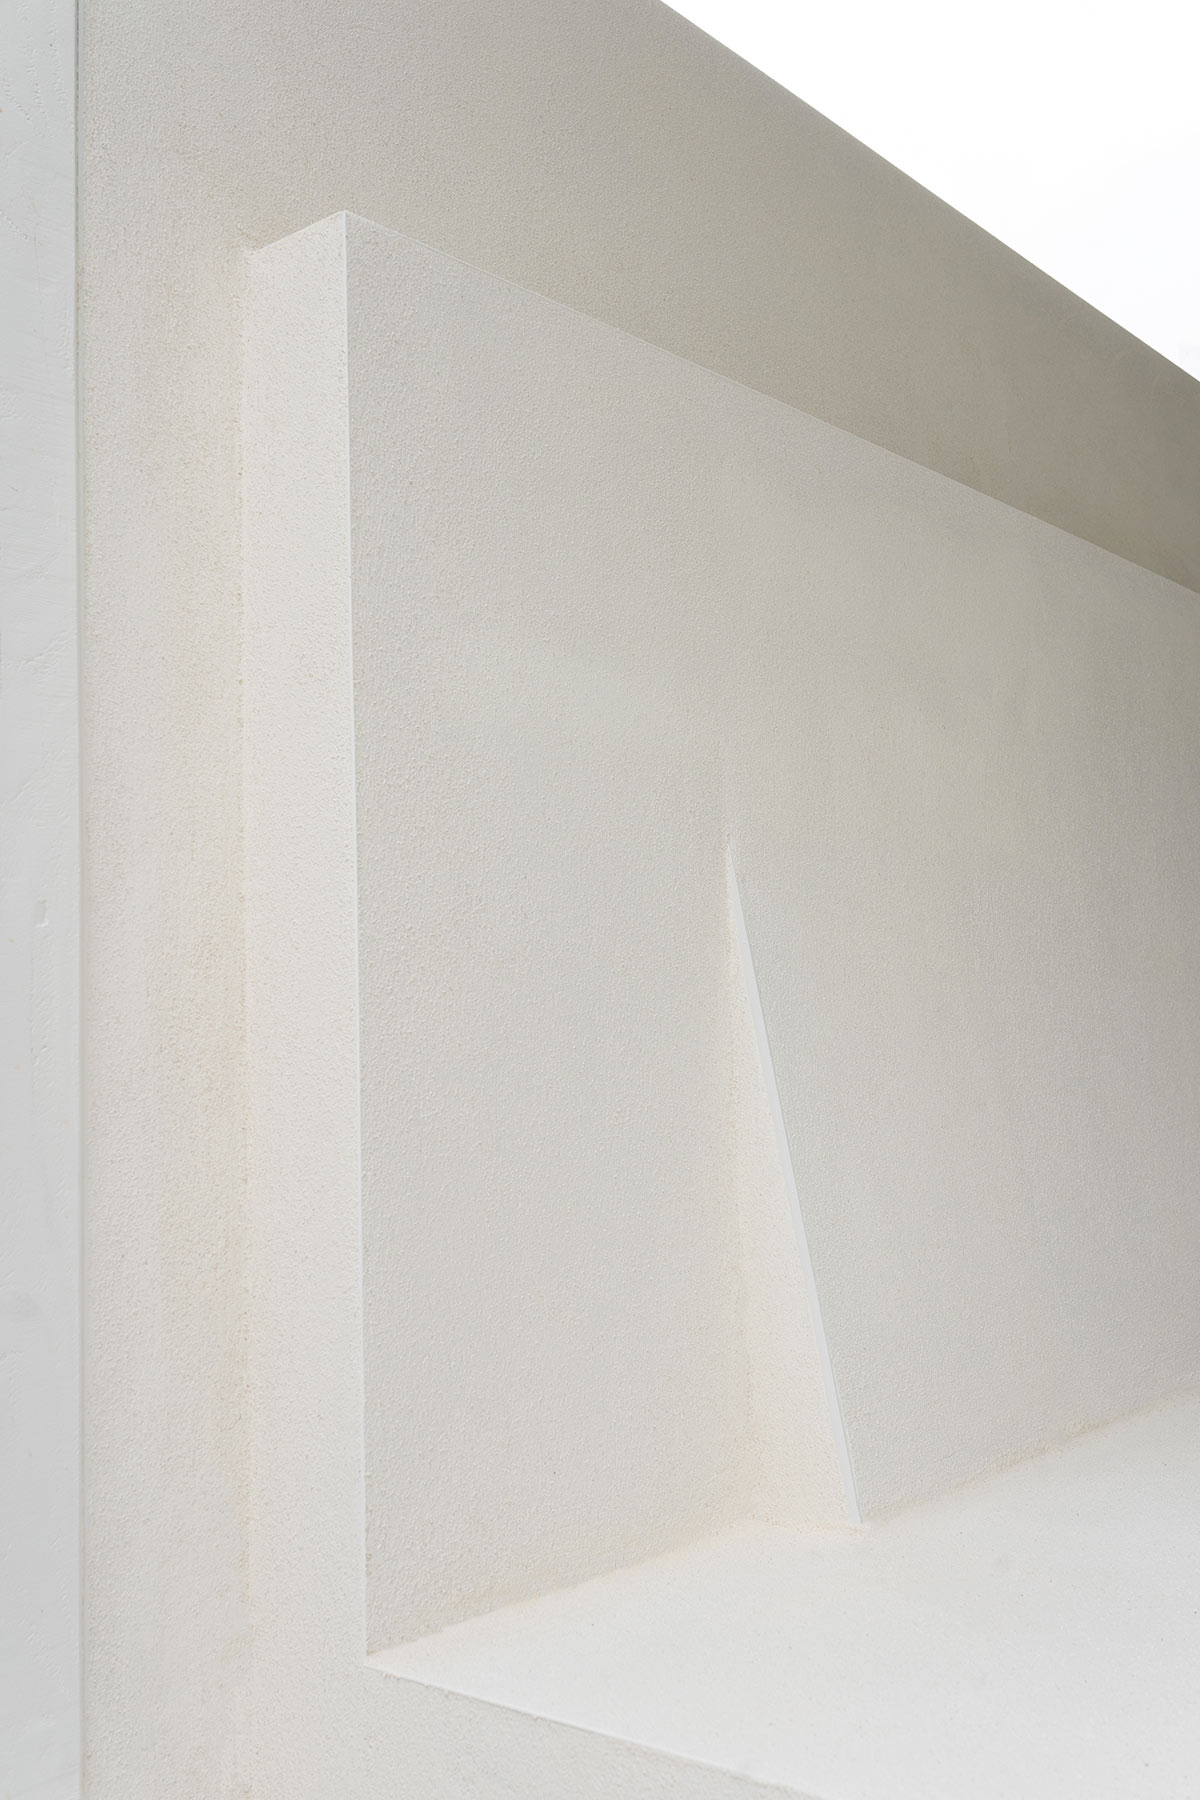 Schuine rugleuning loungebank - Tanja van Hoogdalem